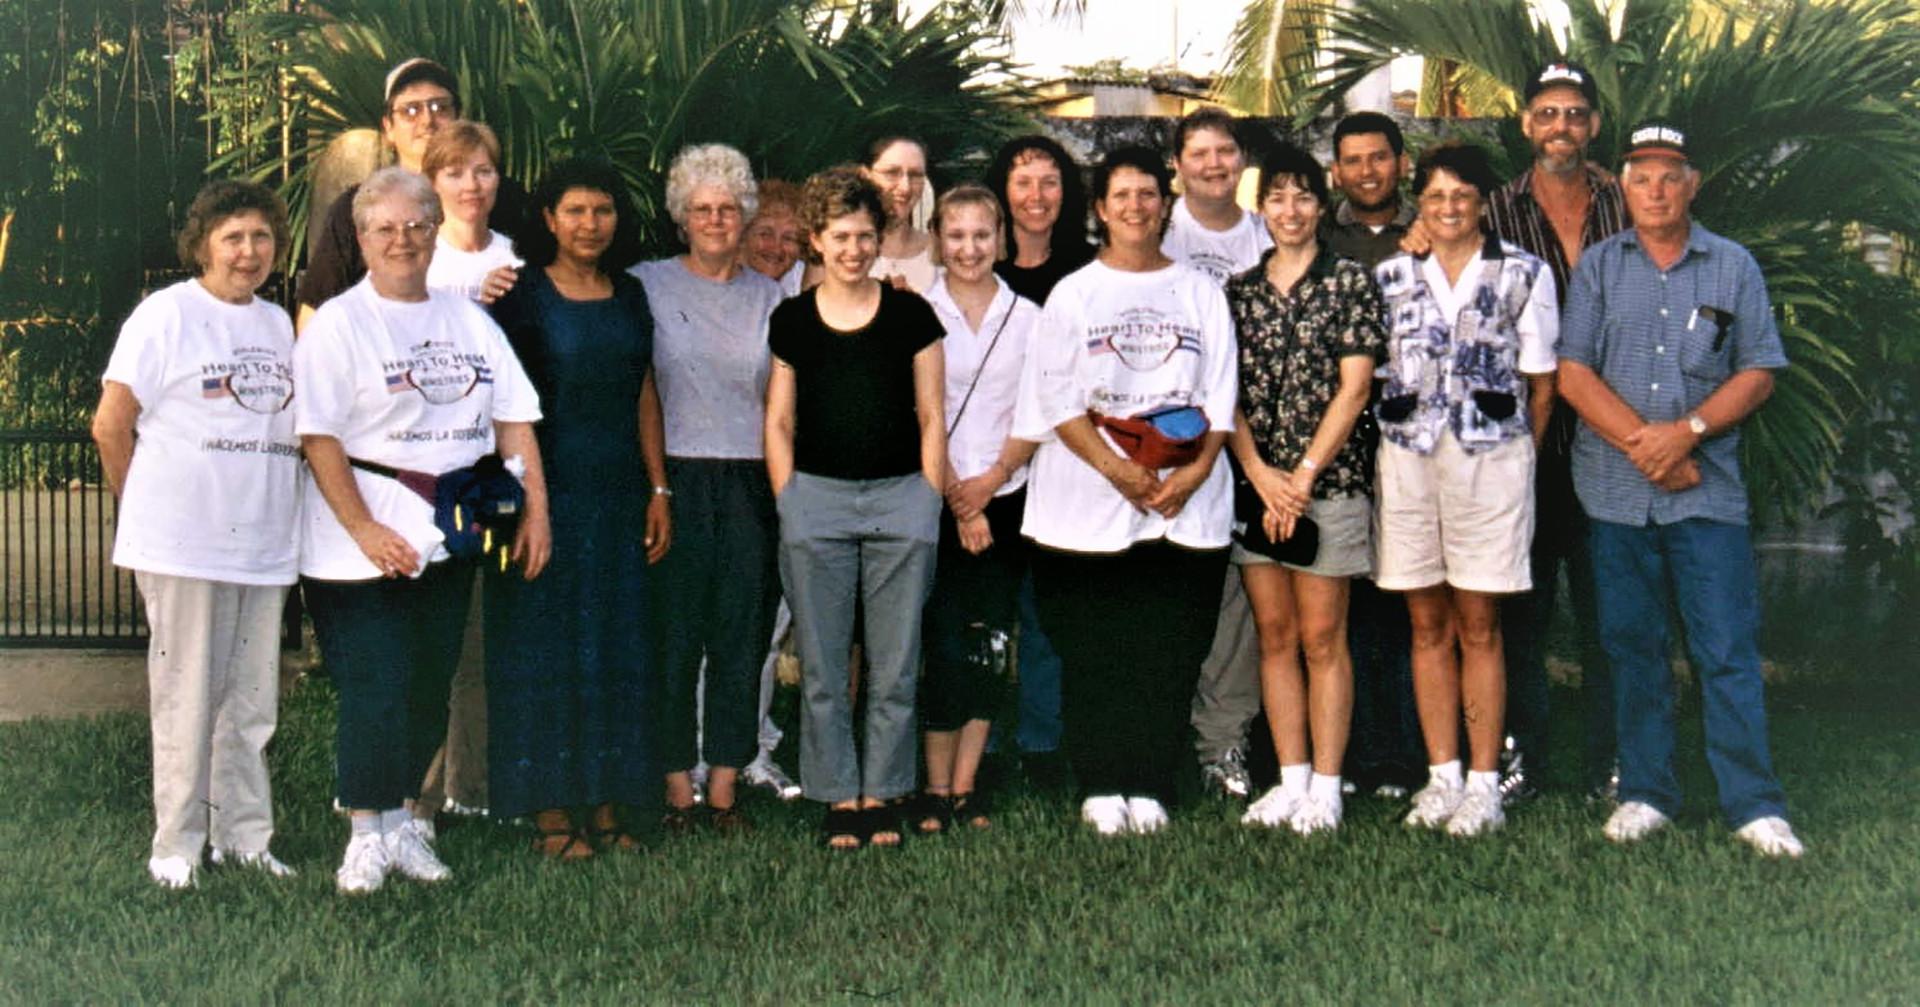 Medical and dental team in Honduras - 2004